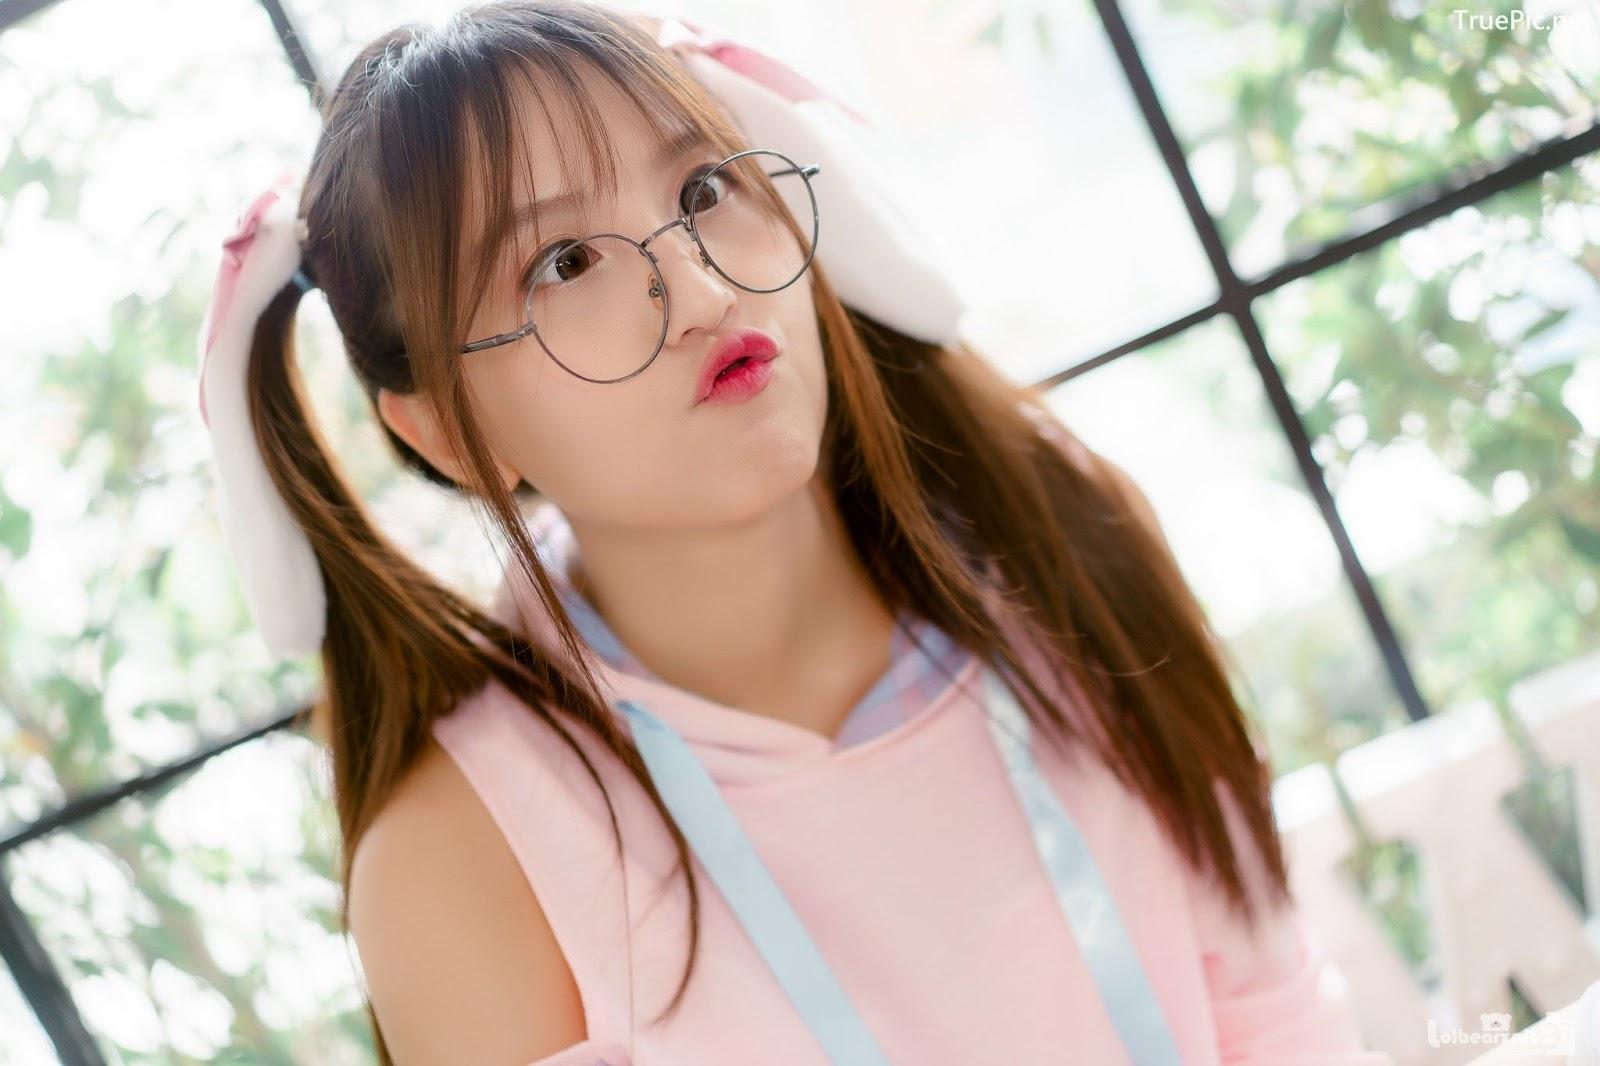 Image Thailand Model - Phunnita Intarapimai - Cute Rabbit Girl - TruePic.net - Picture-9